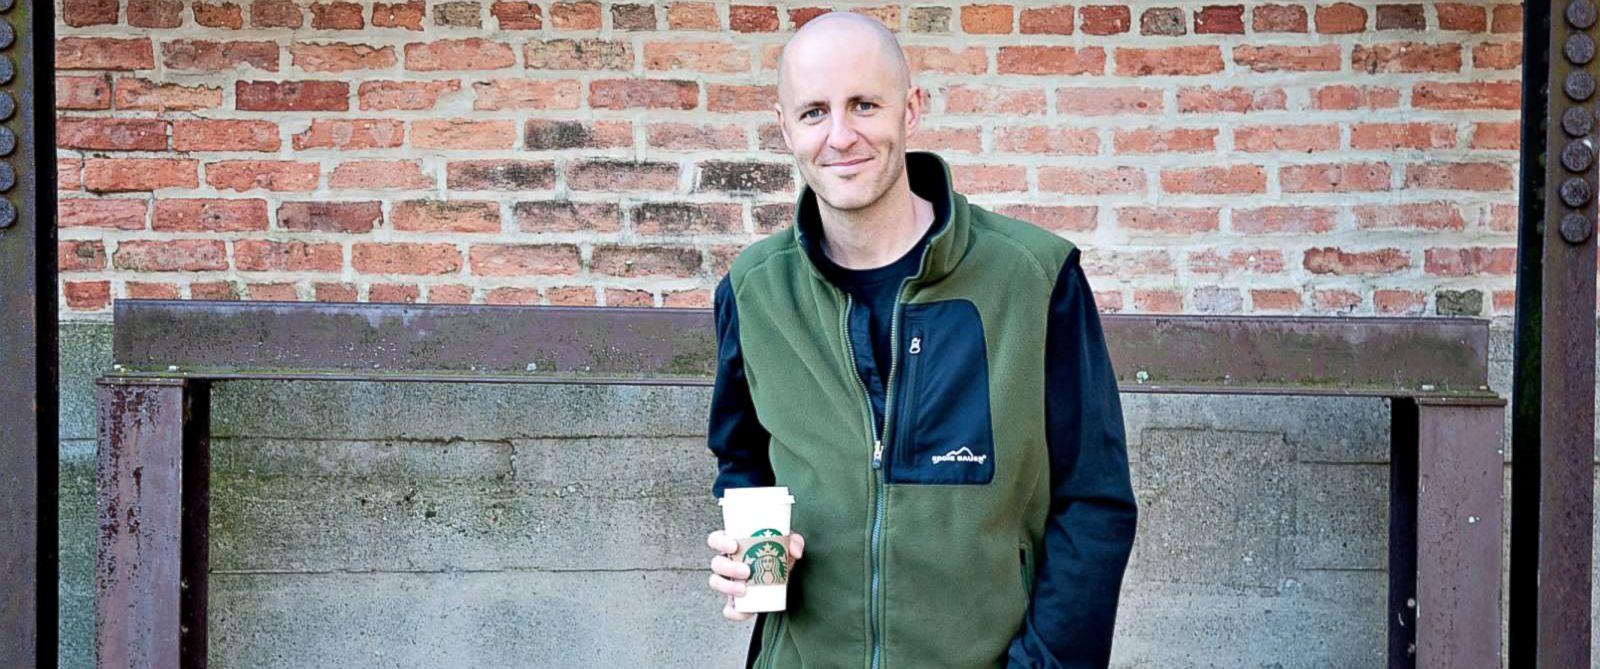 PHOTO: Brian Gardner said he is preparing for Starbucks price hike.